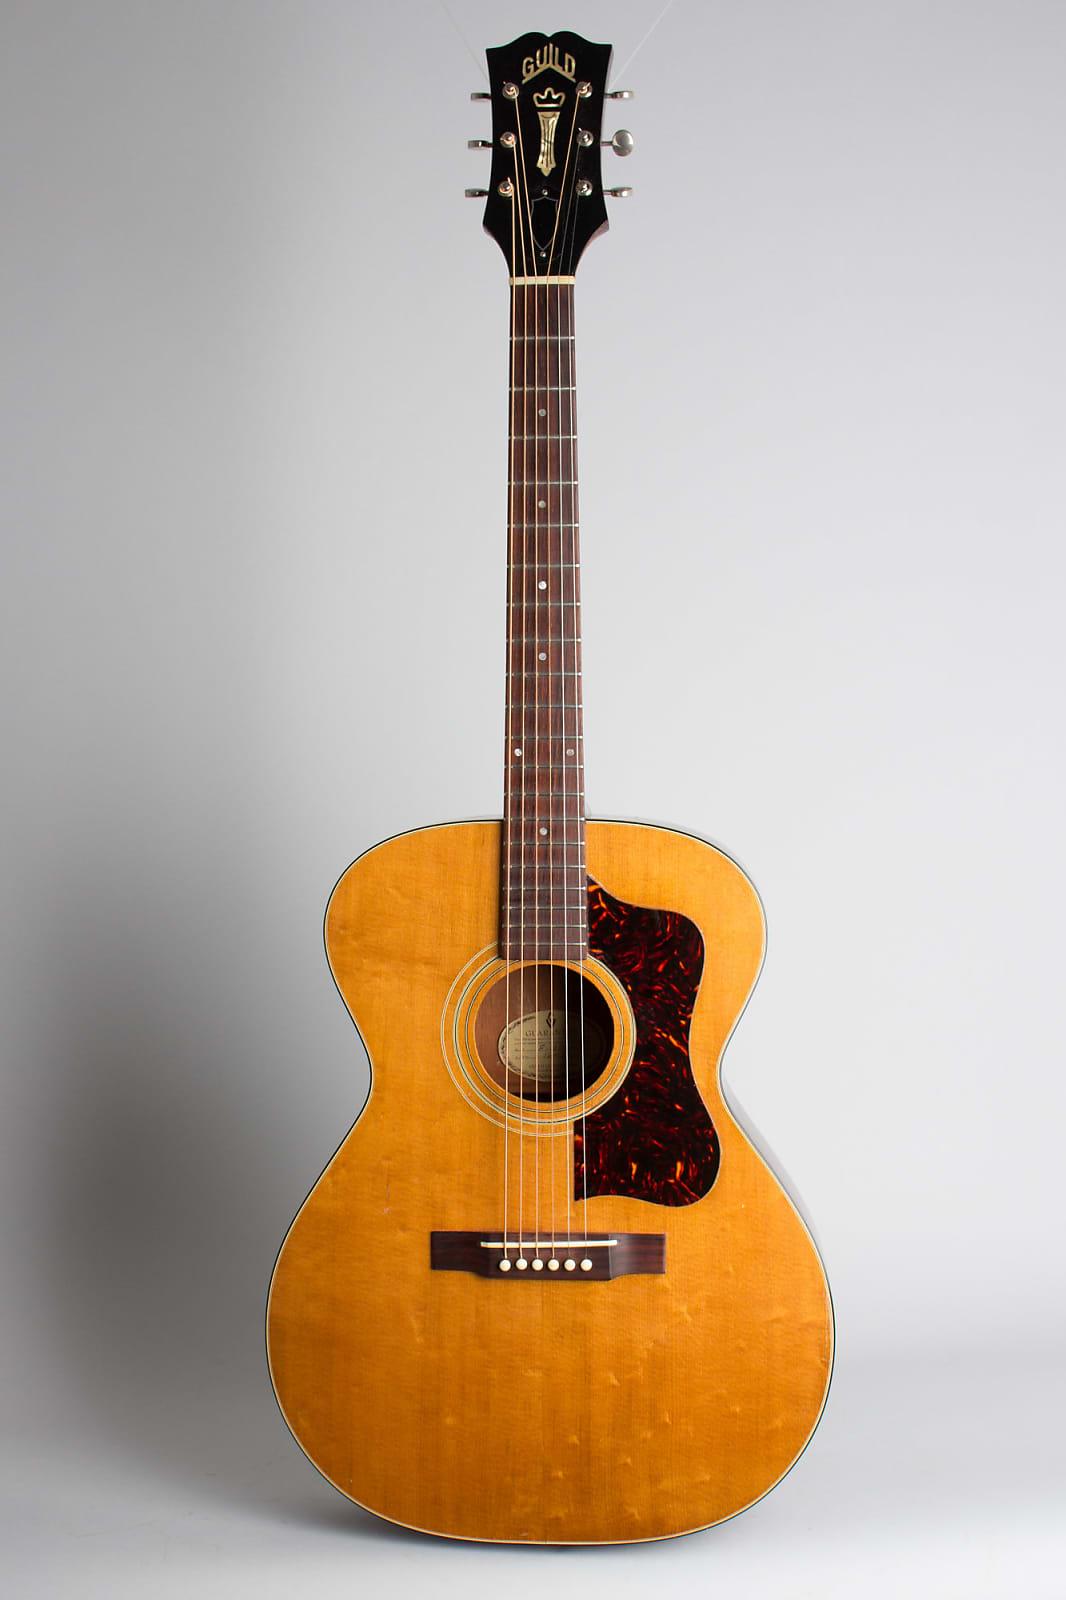 Guild  F-30-NT Flat Top Acoustic Guitar (1961), ser. #16453, original brown alligator grain chipboard case.